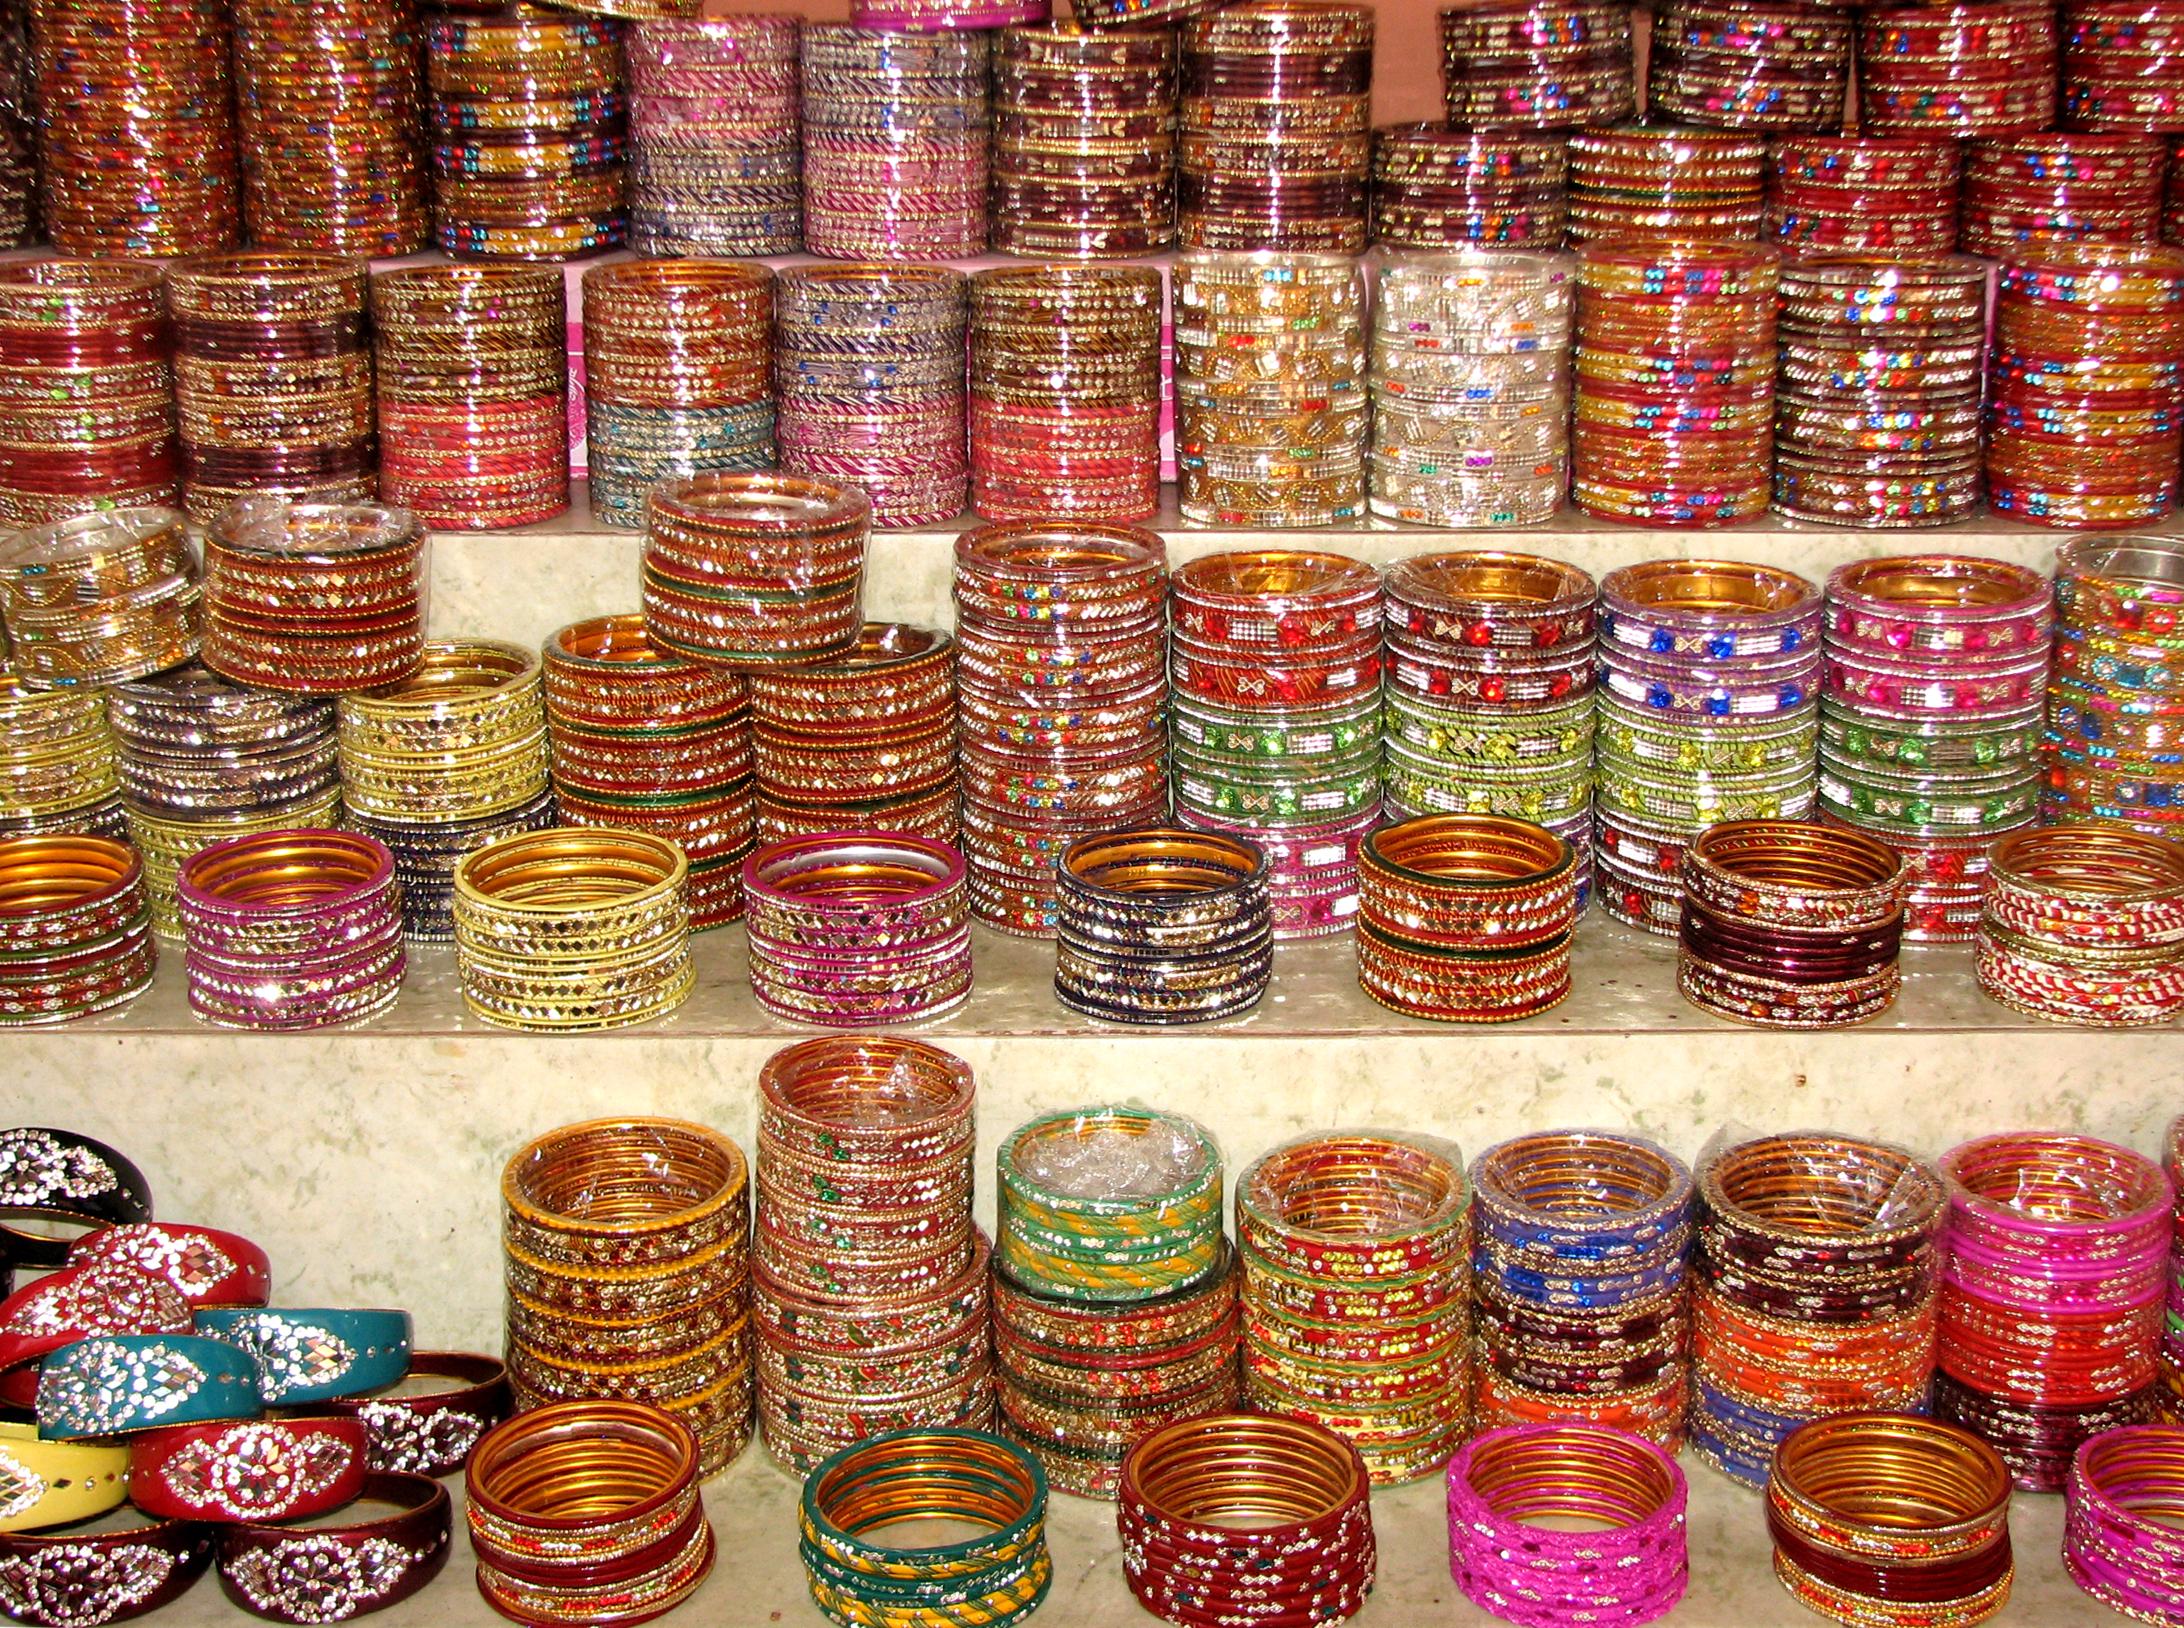 Indian Bangles, Bangle, Bangles, Bracelet, Colors, HQ Photo